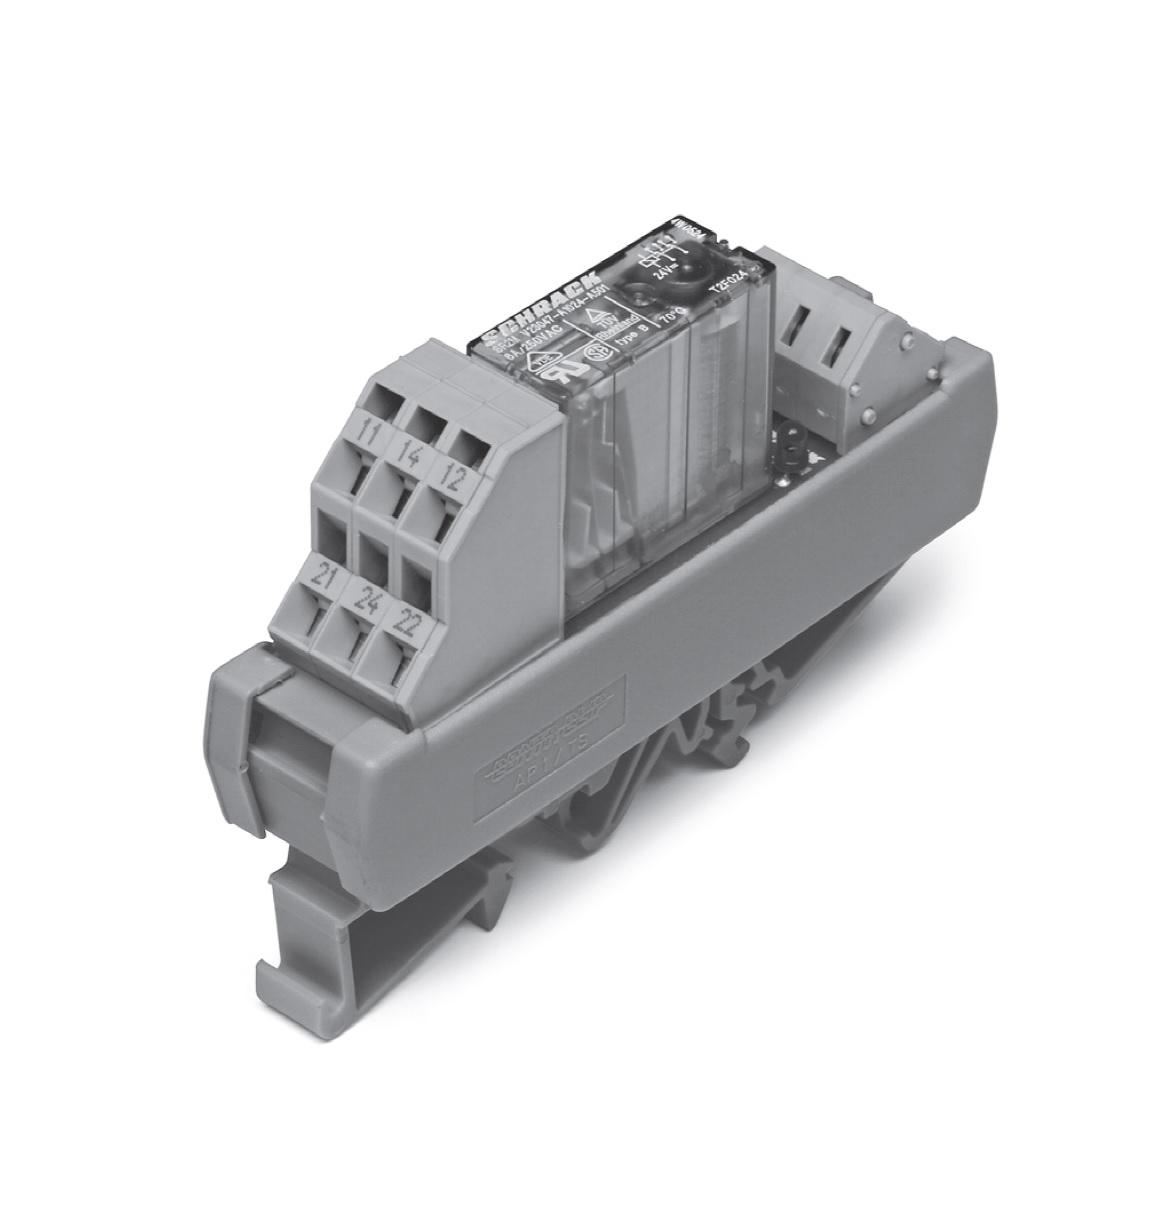 1 Stk Relais mit zwangsgeführten Kontakten, 2W, 24VDC, 6A, DIN SR2ZY024--